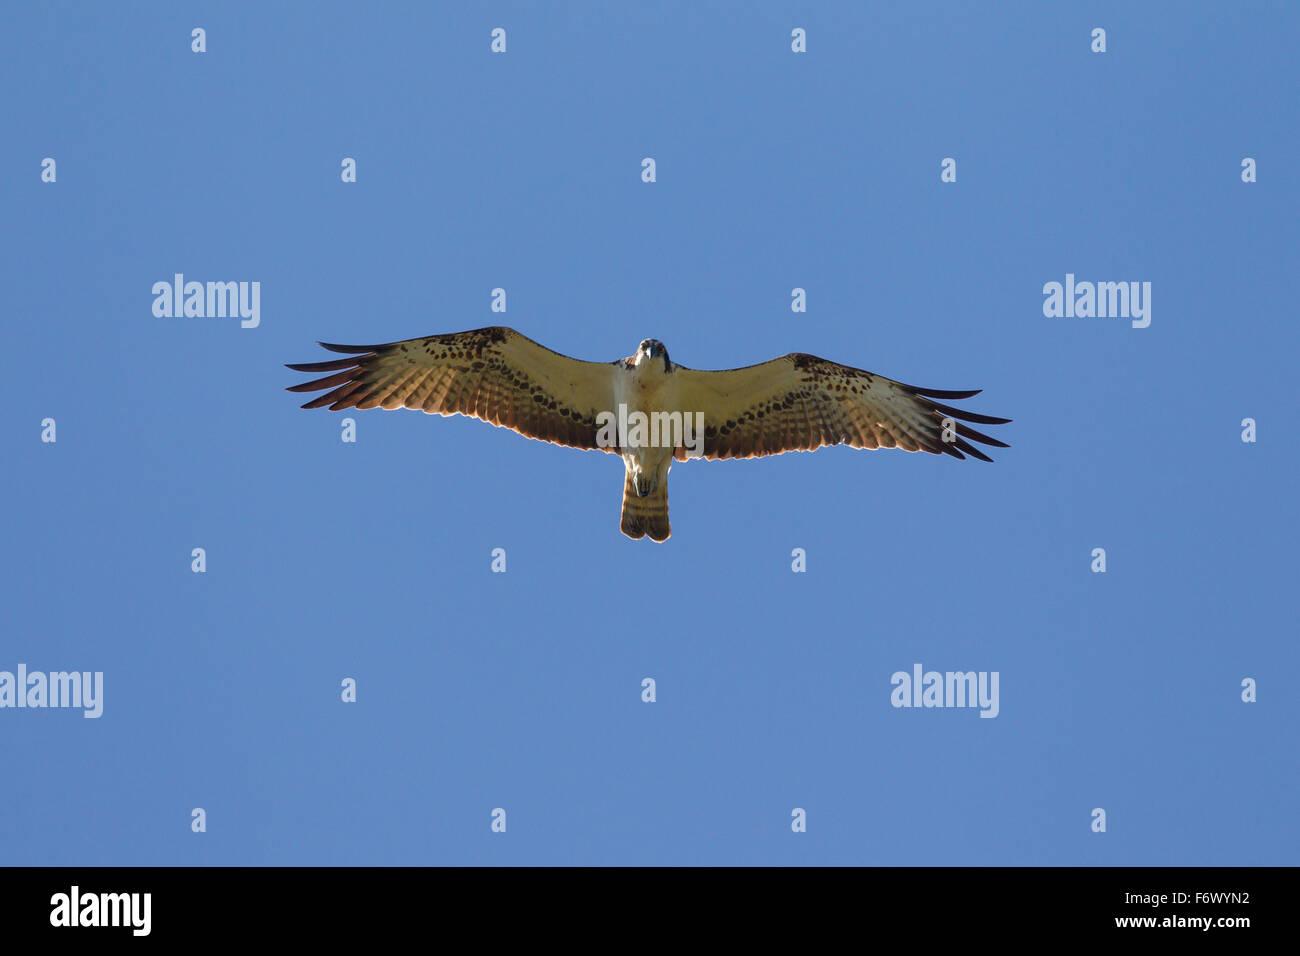 Osprey (Pandion haliaetus) soaring against blue sky - Stock Image